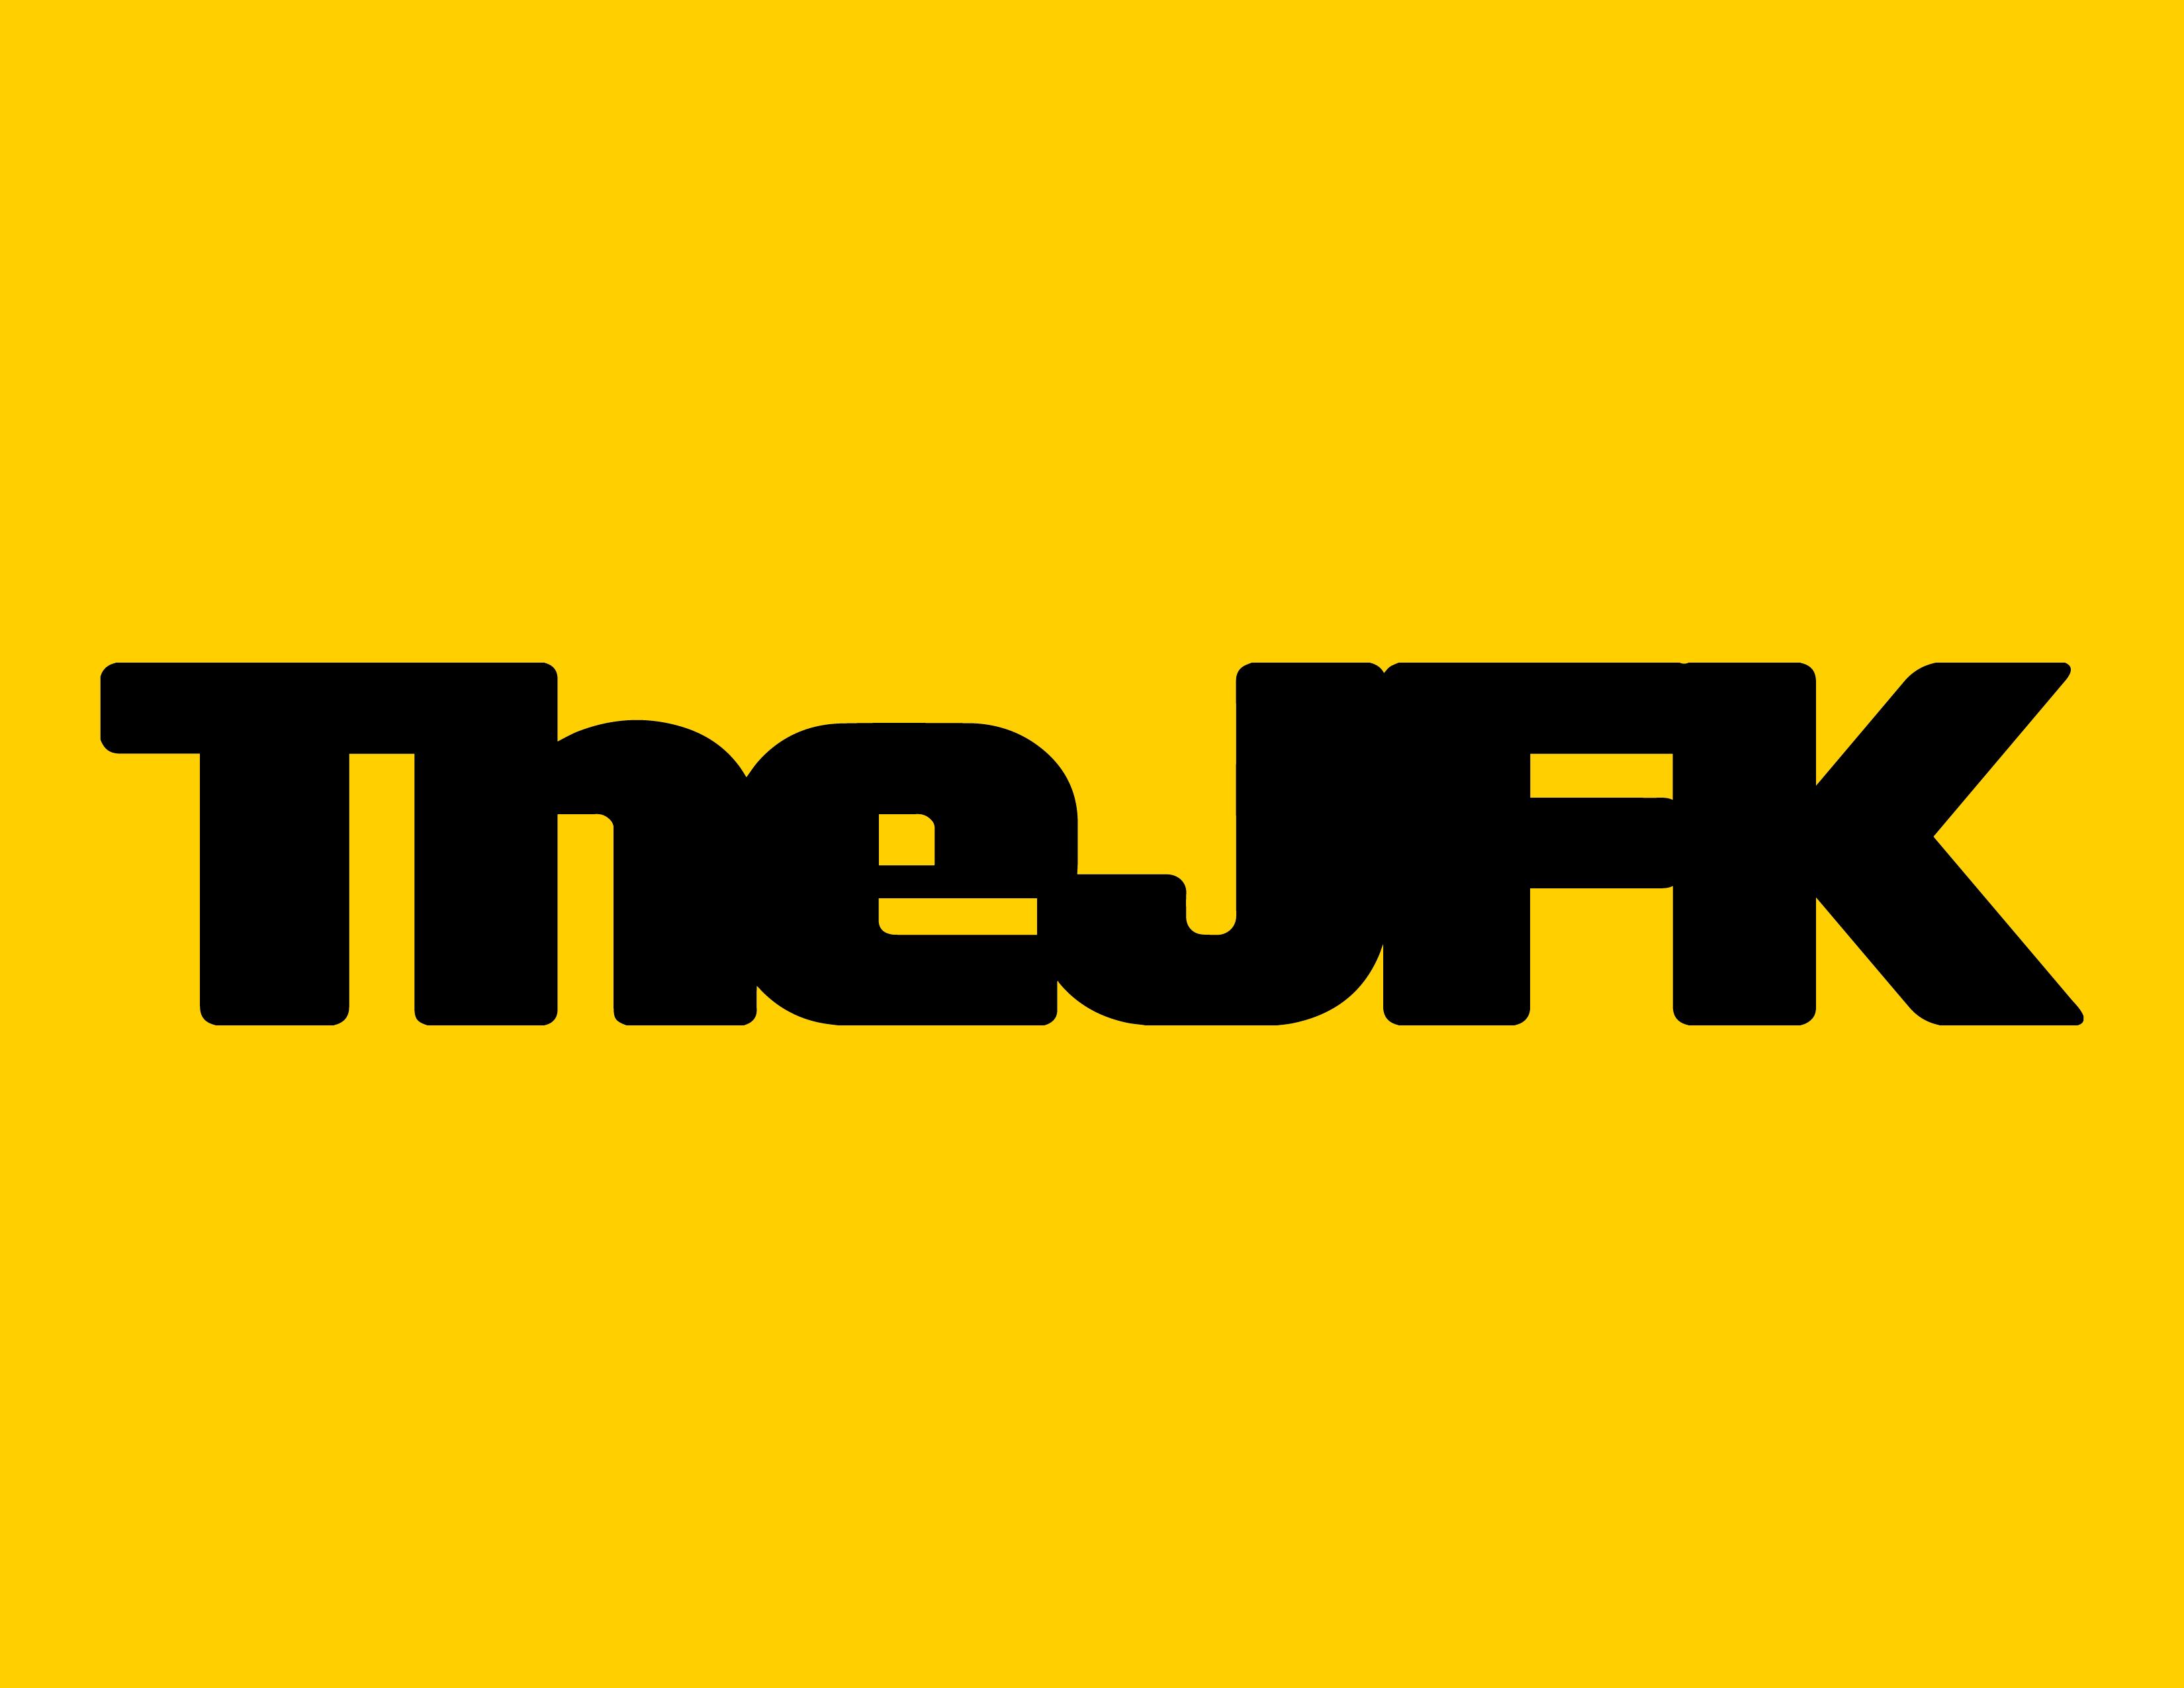 The JFK